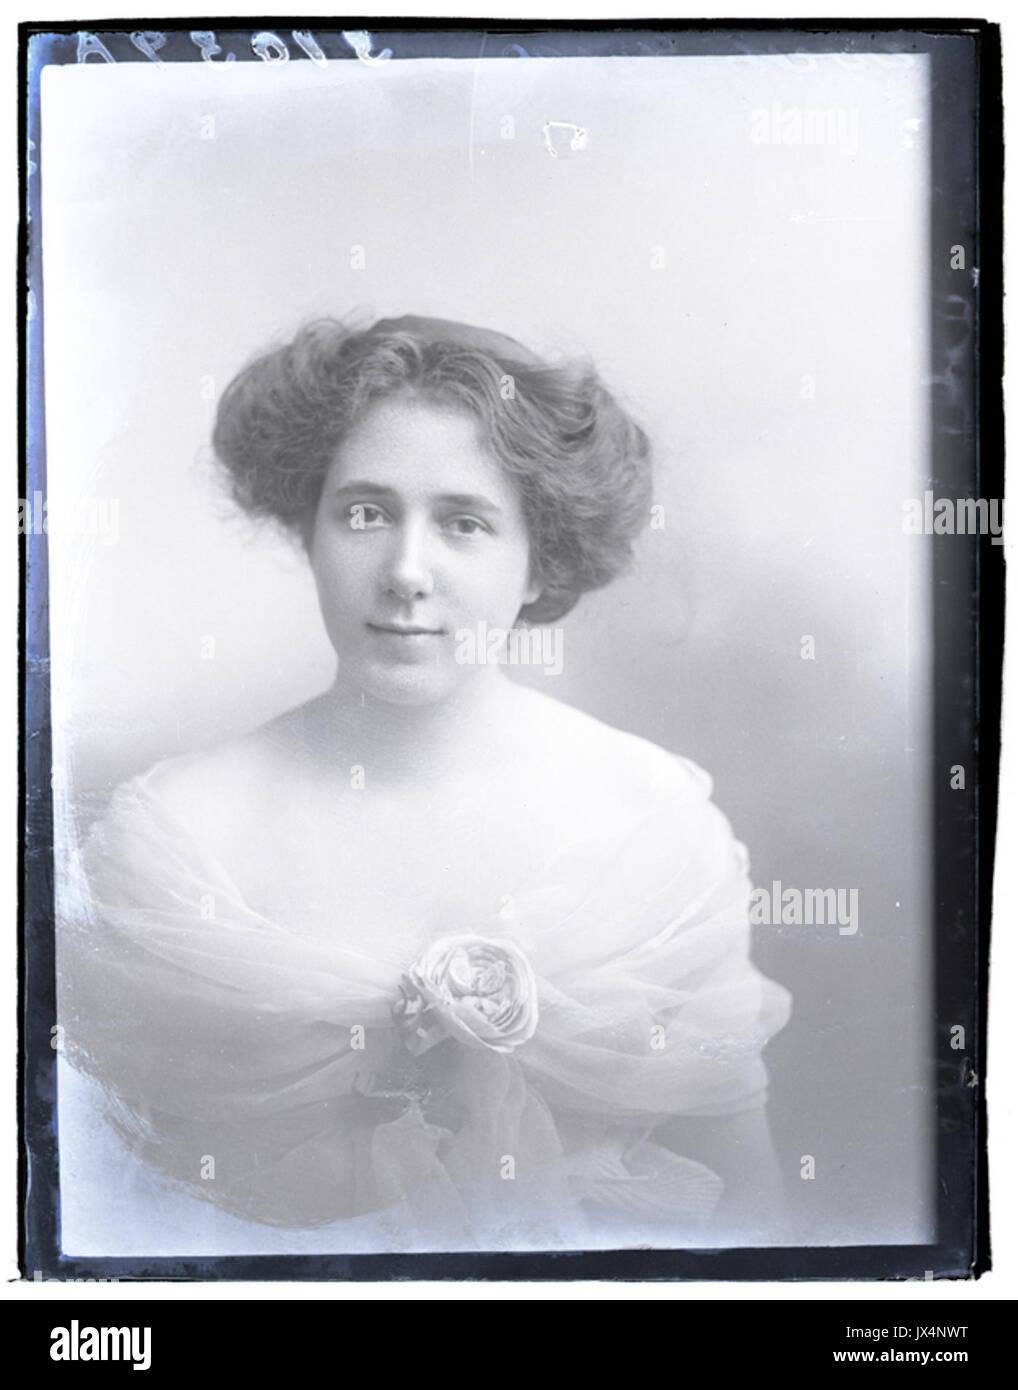 Miss Evett, 11 Nov 1916 (17065222451) - Stock Image